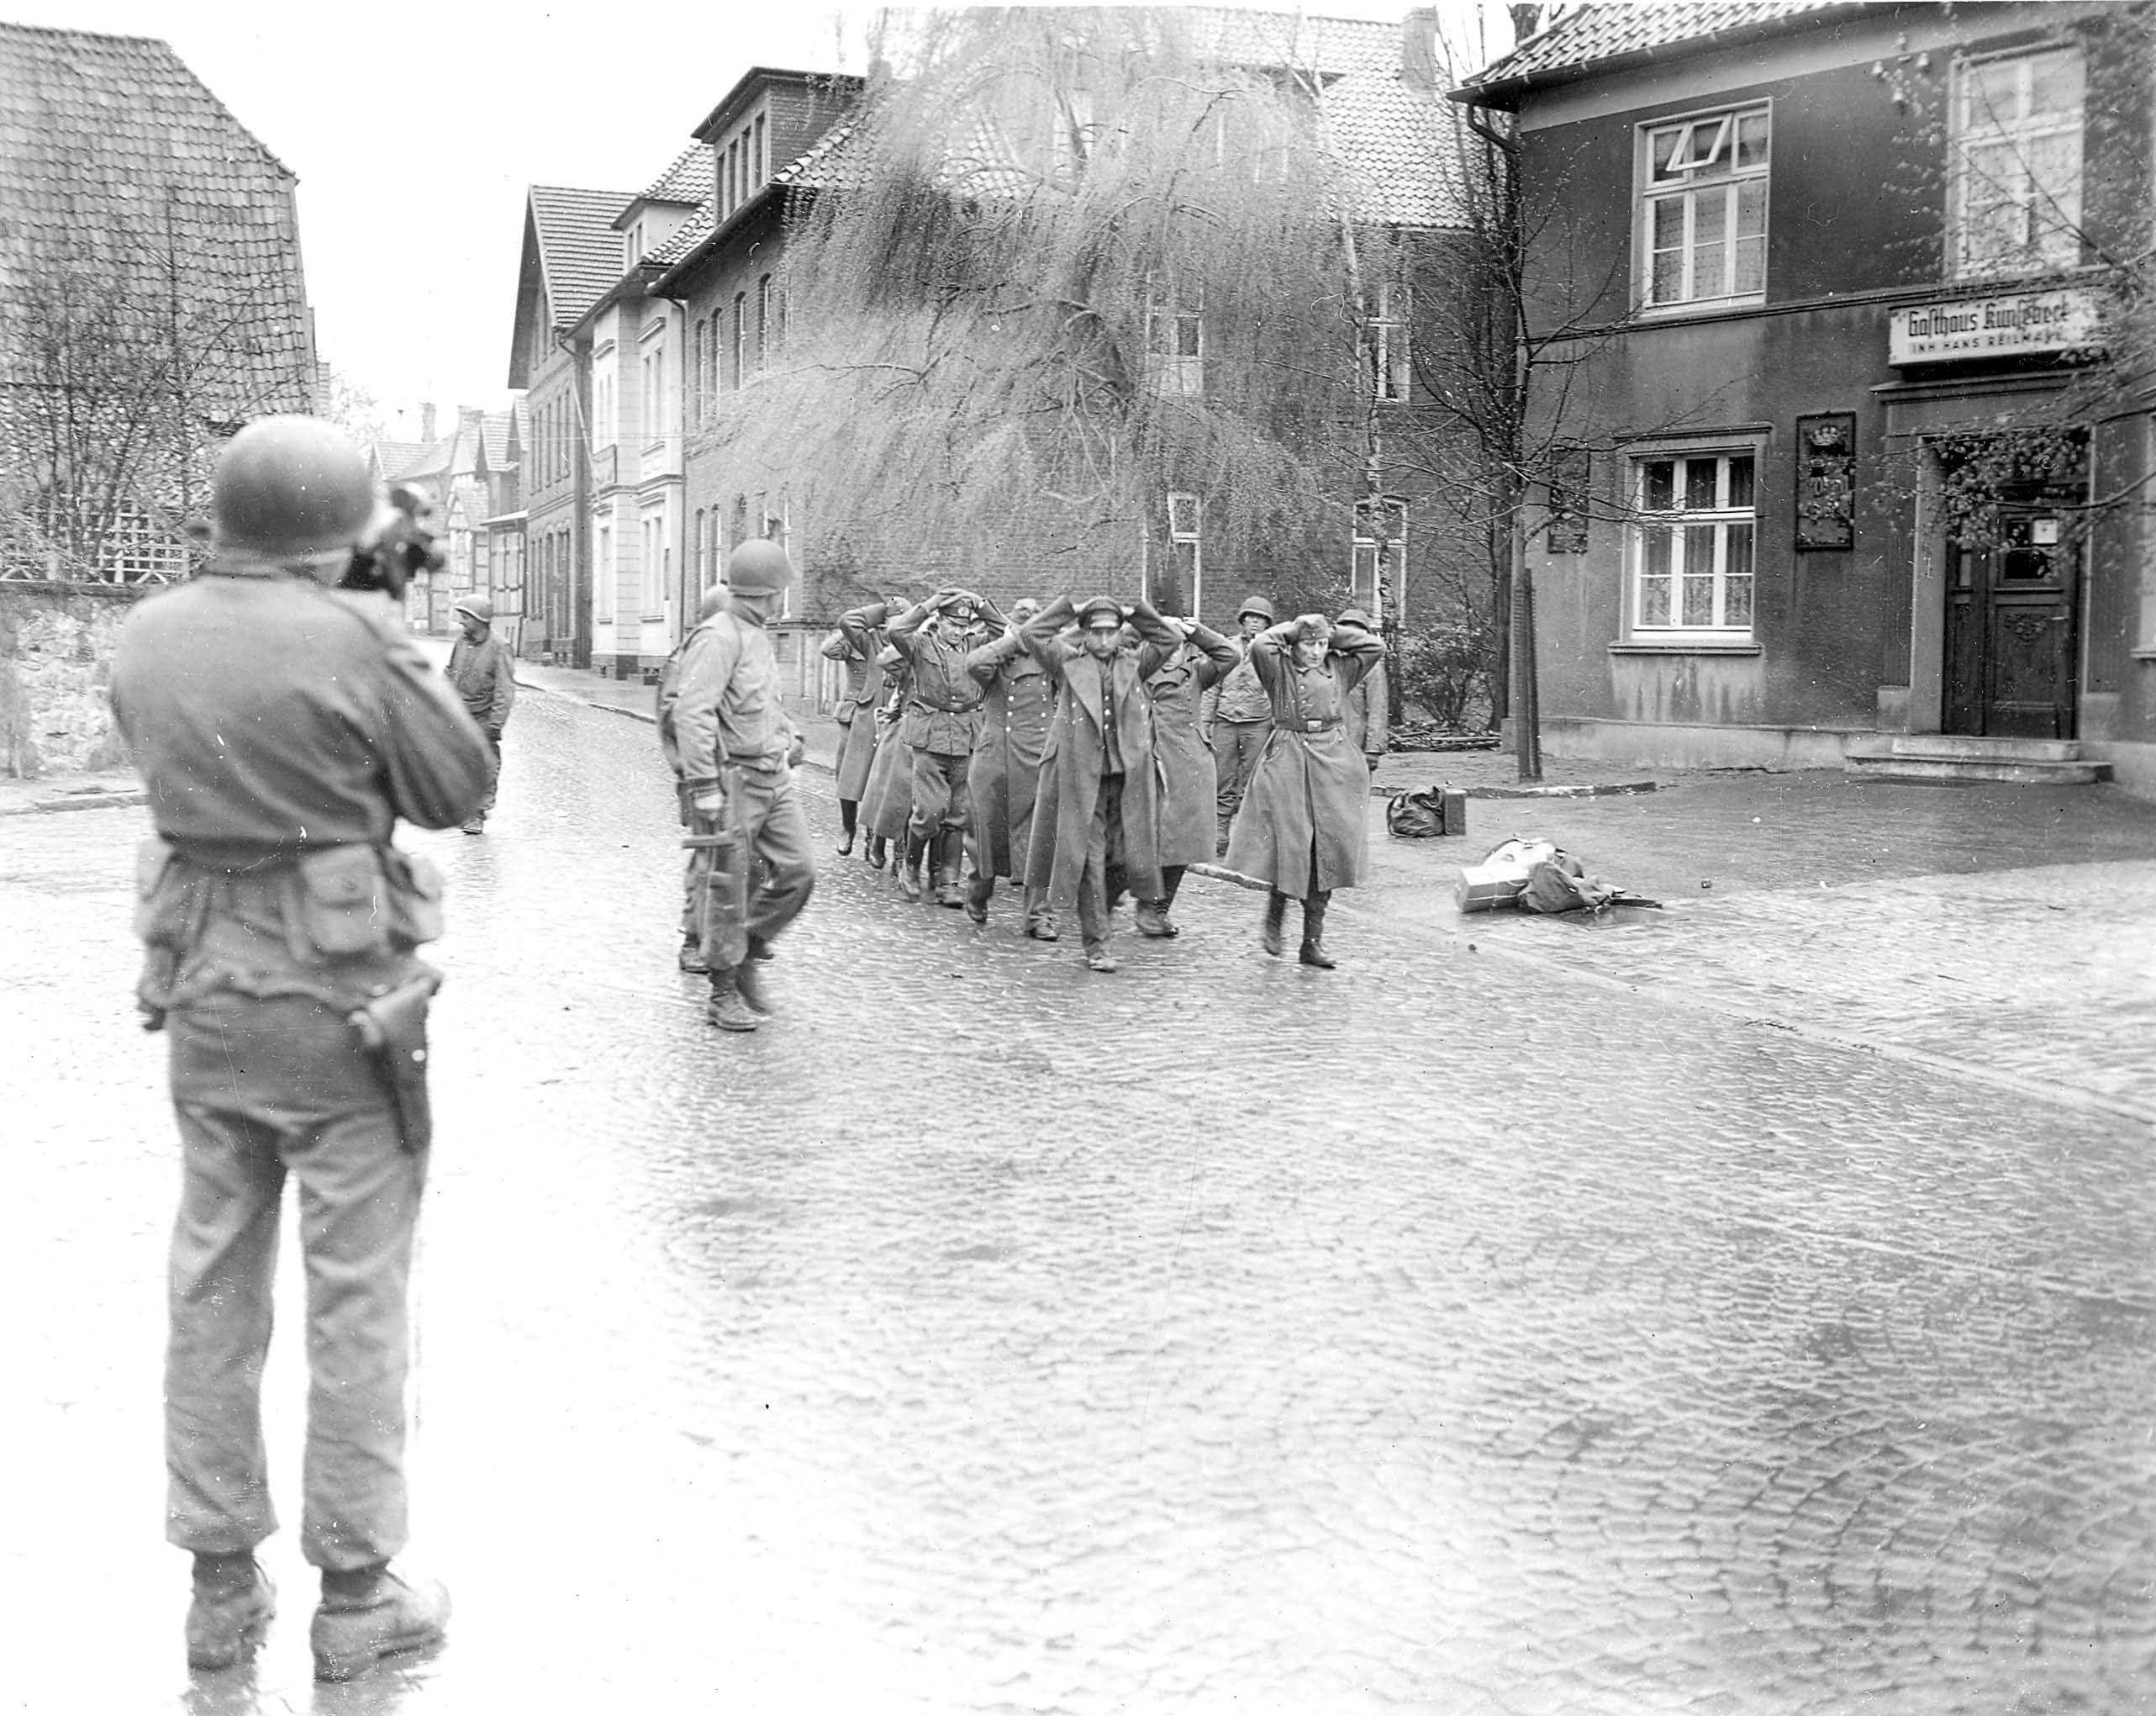 US-Truppen nehmen in der Rosenstraße deutsche Soldaten gefangen. Foto: Frank van der Veer.